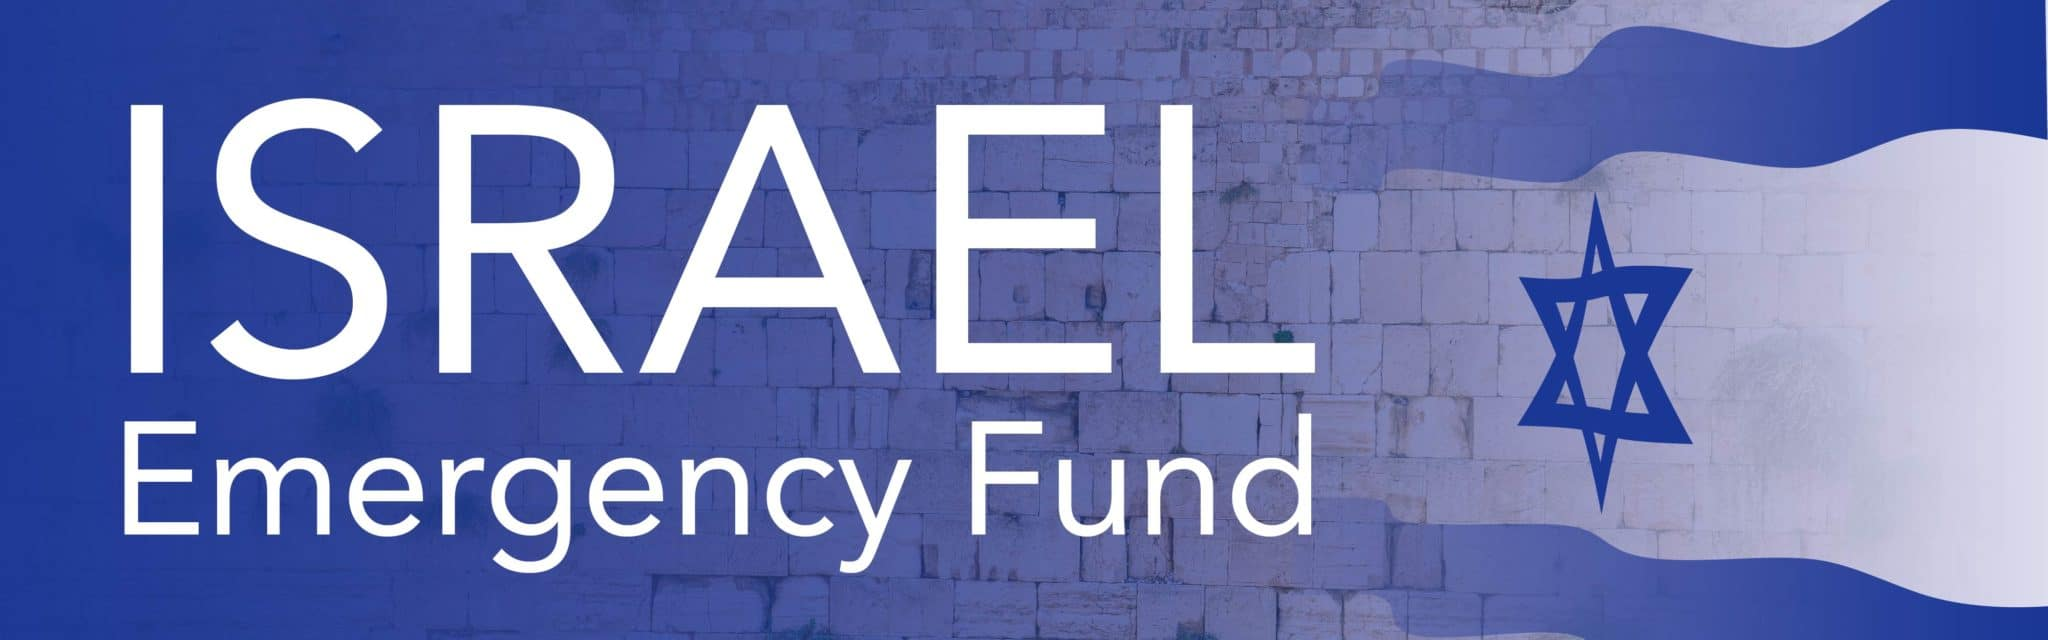 Israel Fund Registration